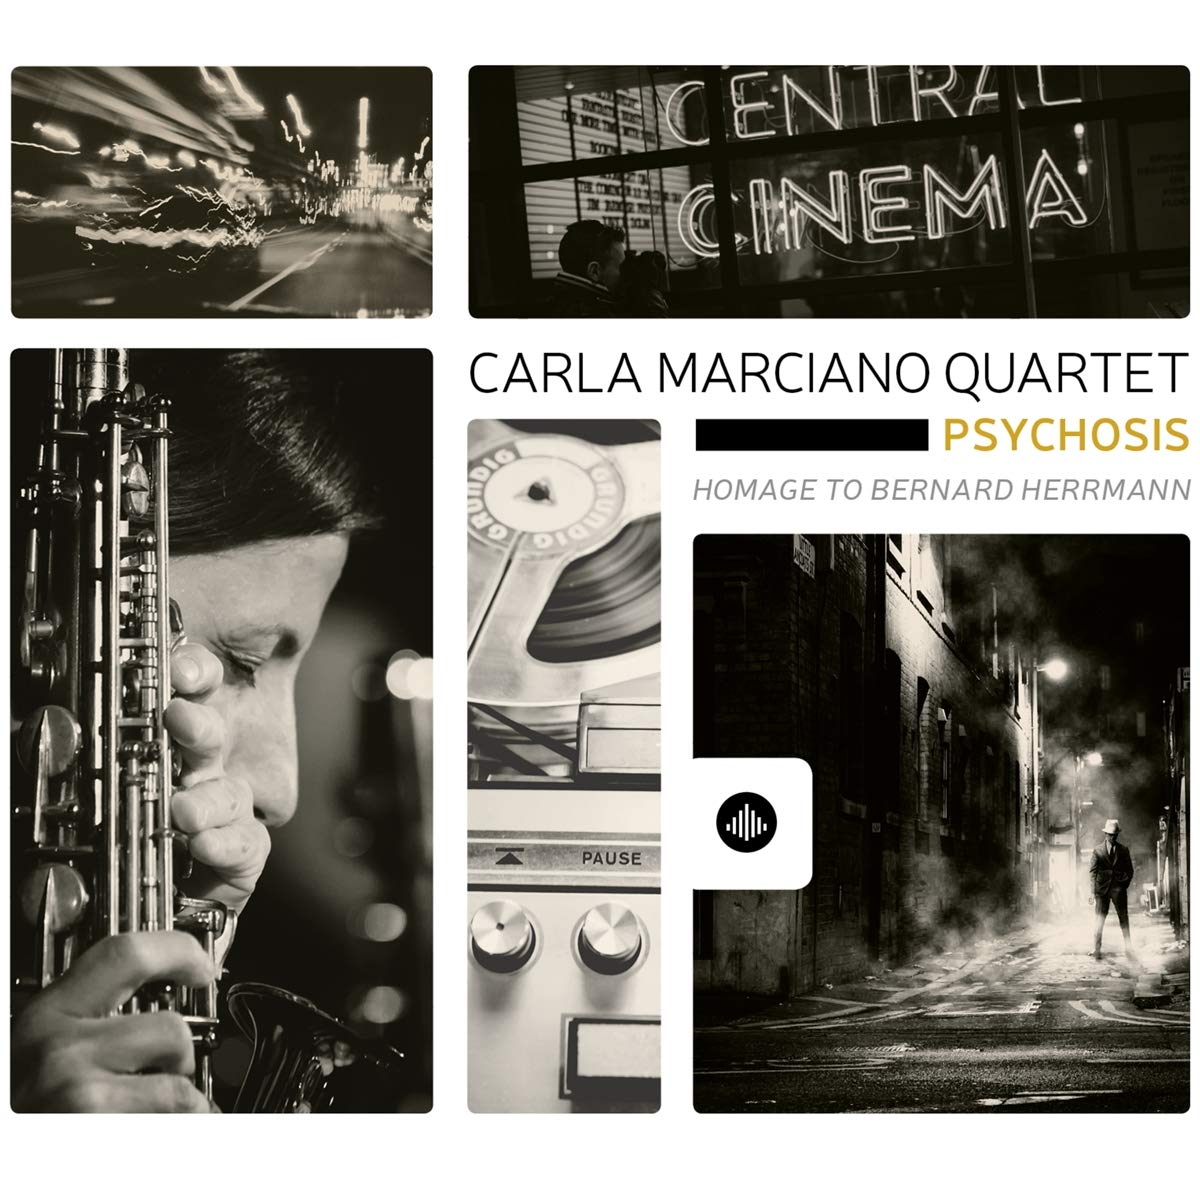 CARLA MARCIANO - Psychosis - Homage to Bernard Herrmann cover